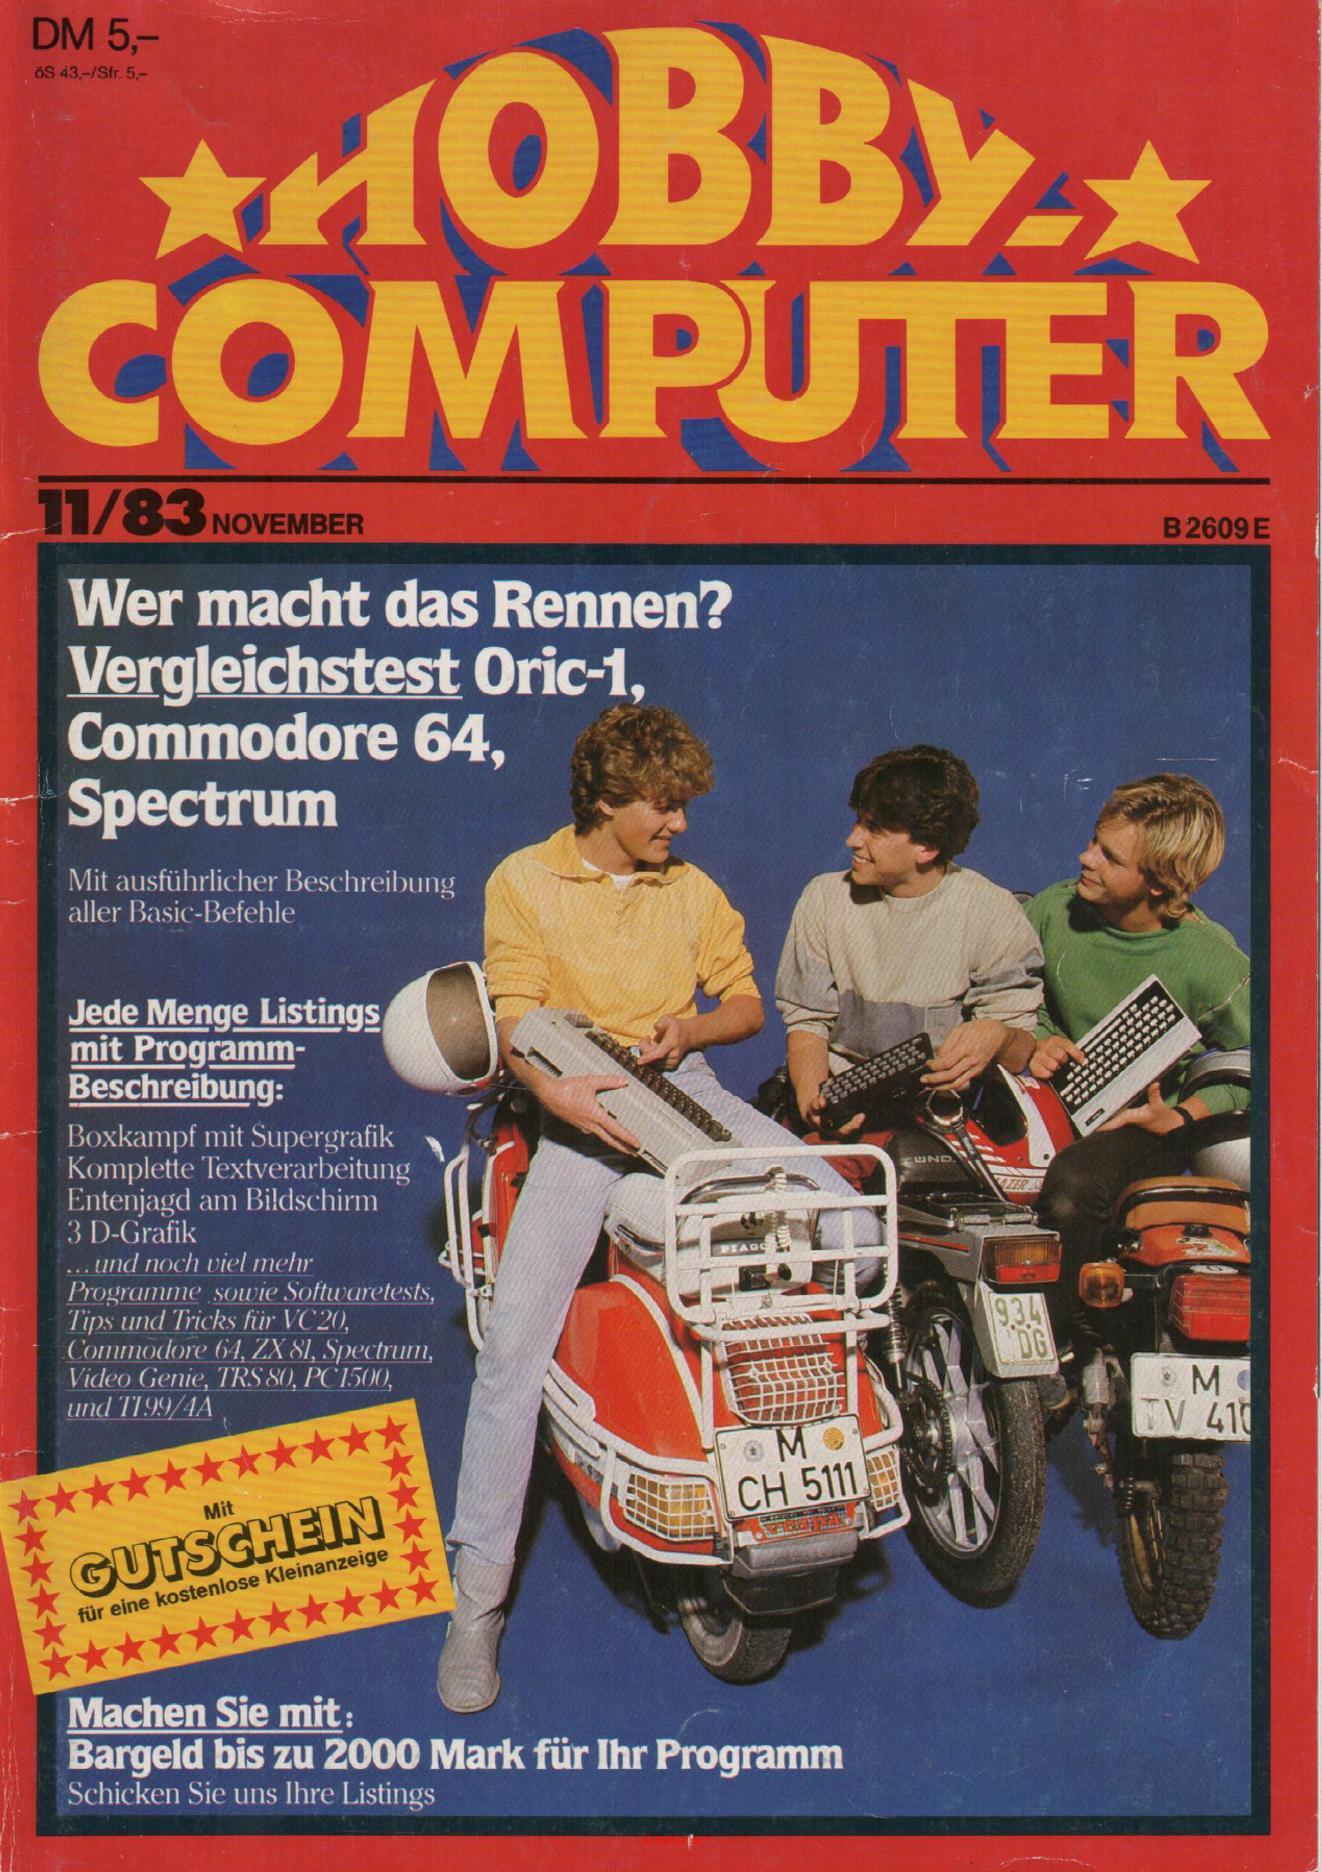 Hobby.Computer.N01.1983.11-AndreBetz_0000